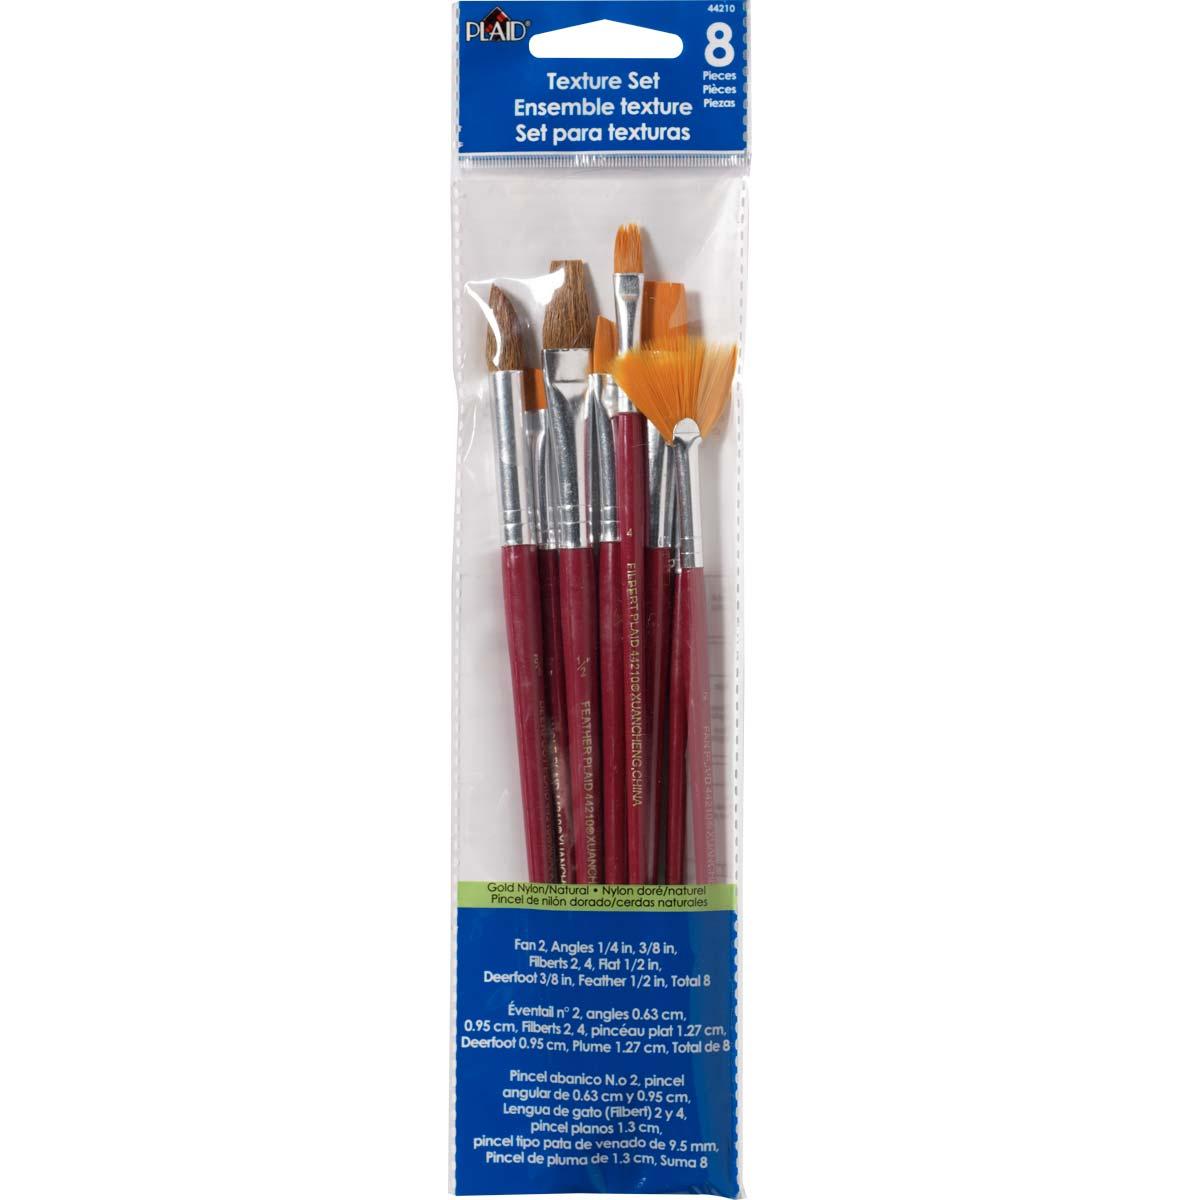 Plaid ® Brush Sets - Texture